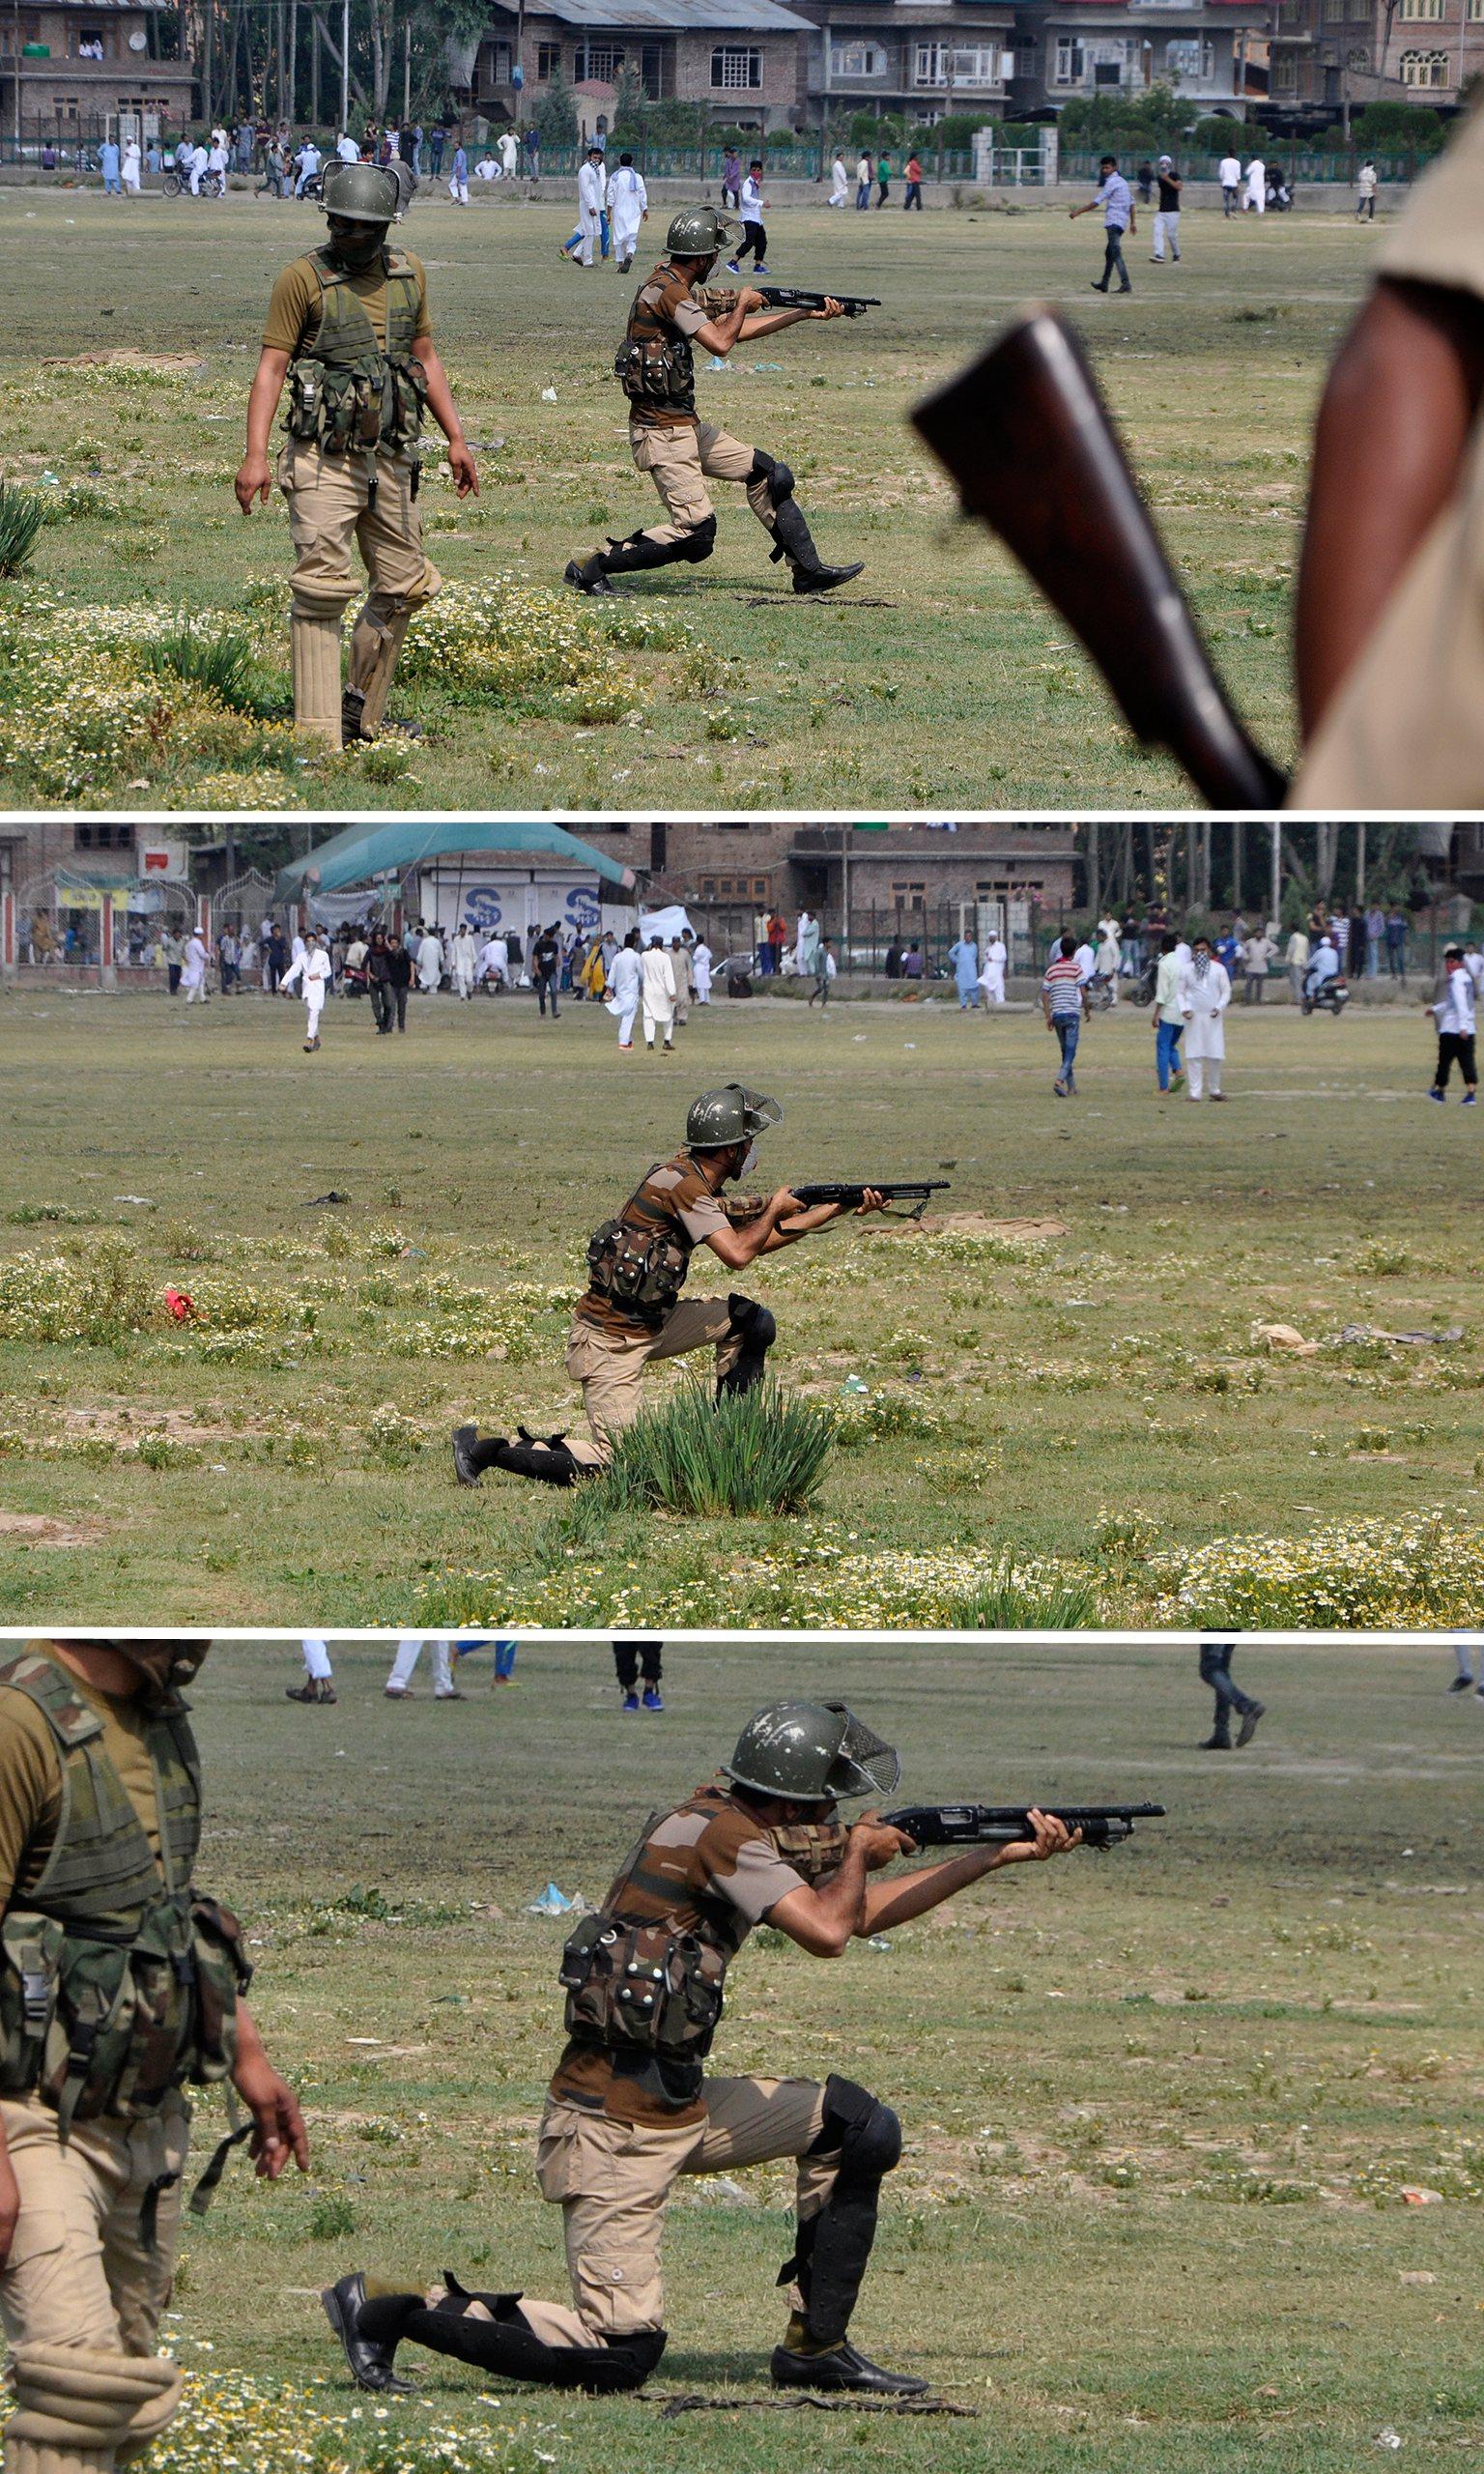 An Indian policeman aims a pellet gun towards Kashmiri protesters in Srinagar in July. Composite: Syed Shahriyar/Syed Shahriyar/NurPhoto via Getty Images